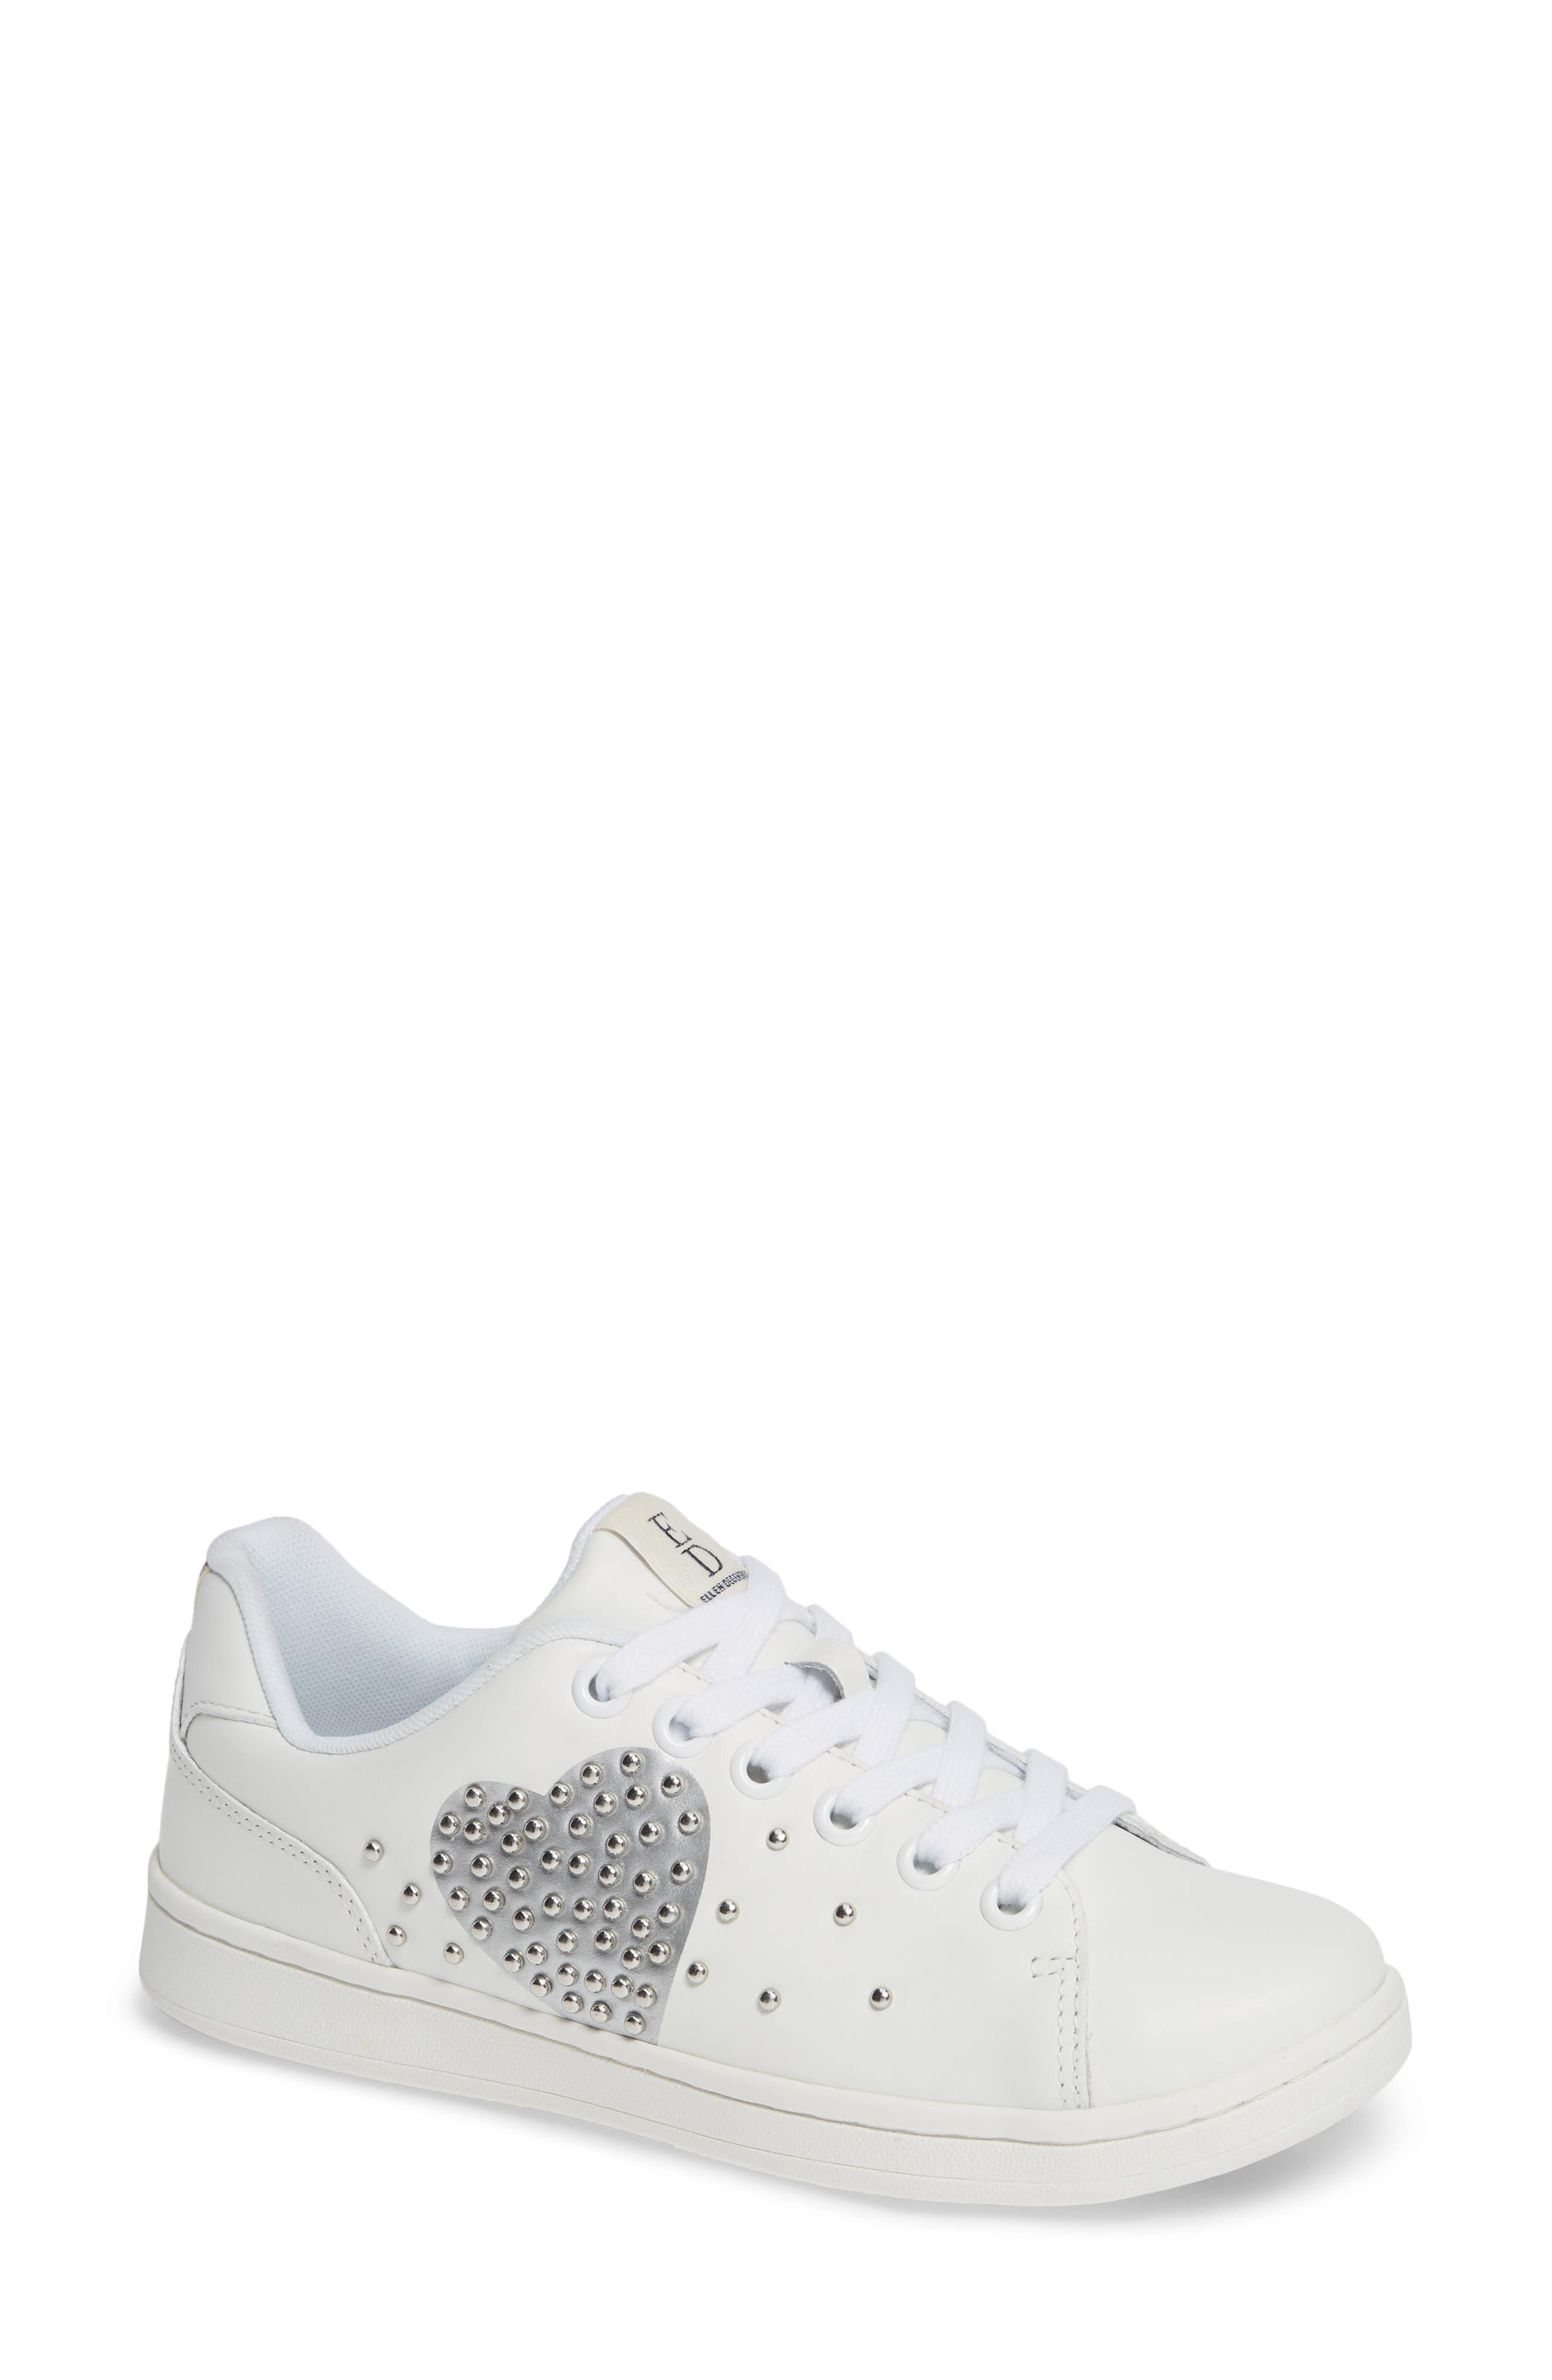 c21e9fbd52a9 Ed Ellen Degeneres Chamour Sneaker